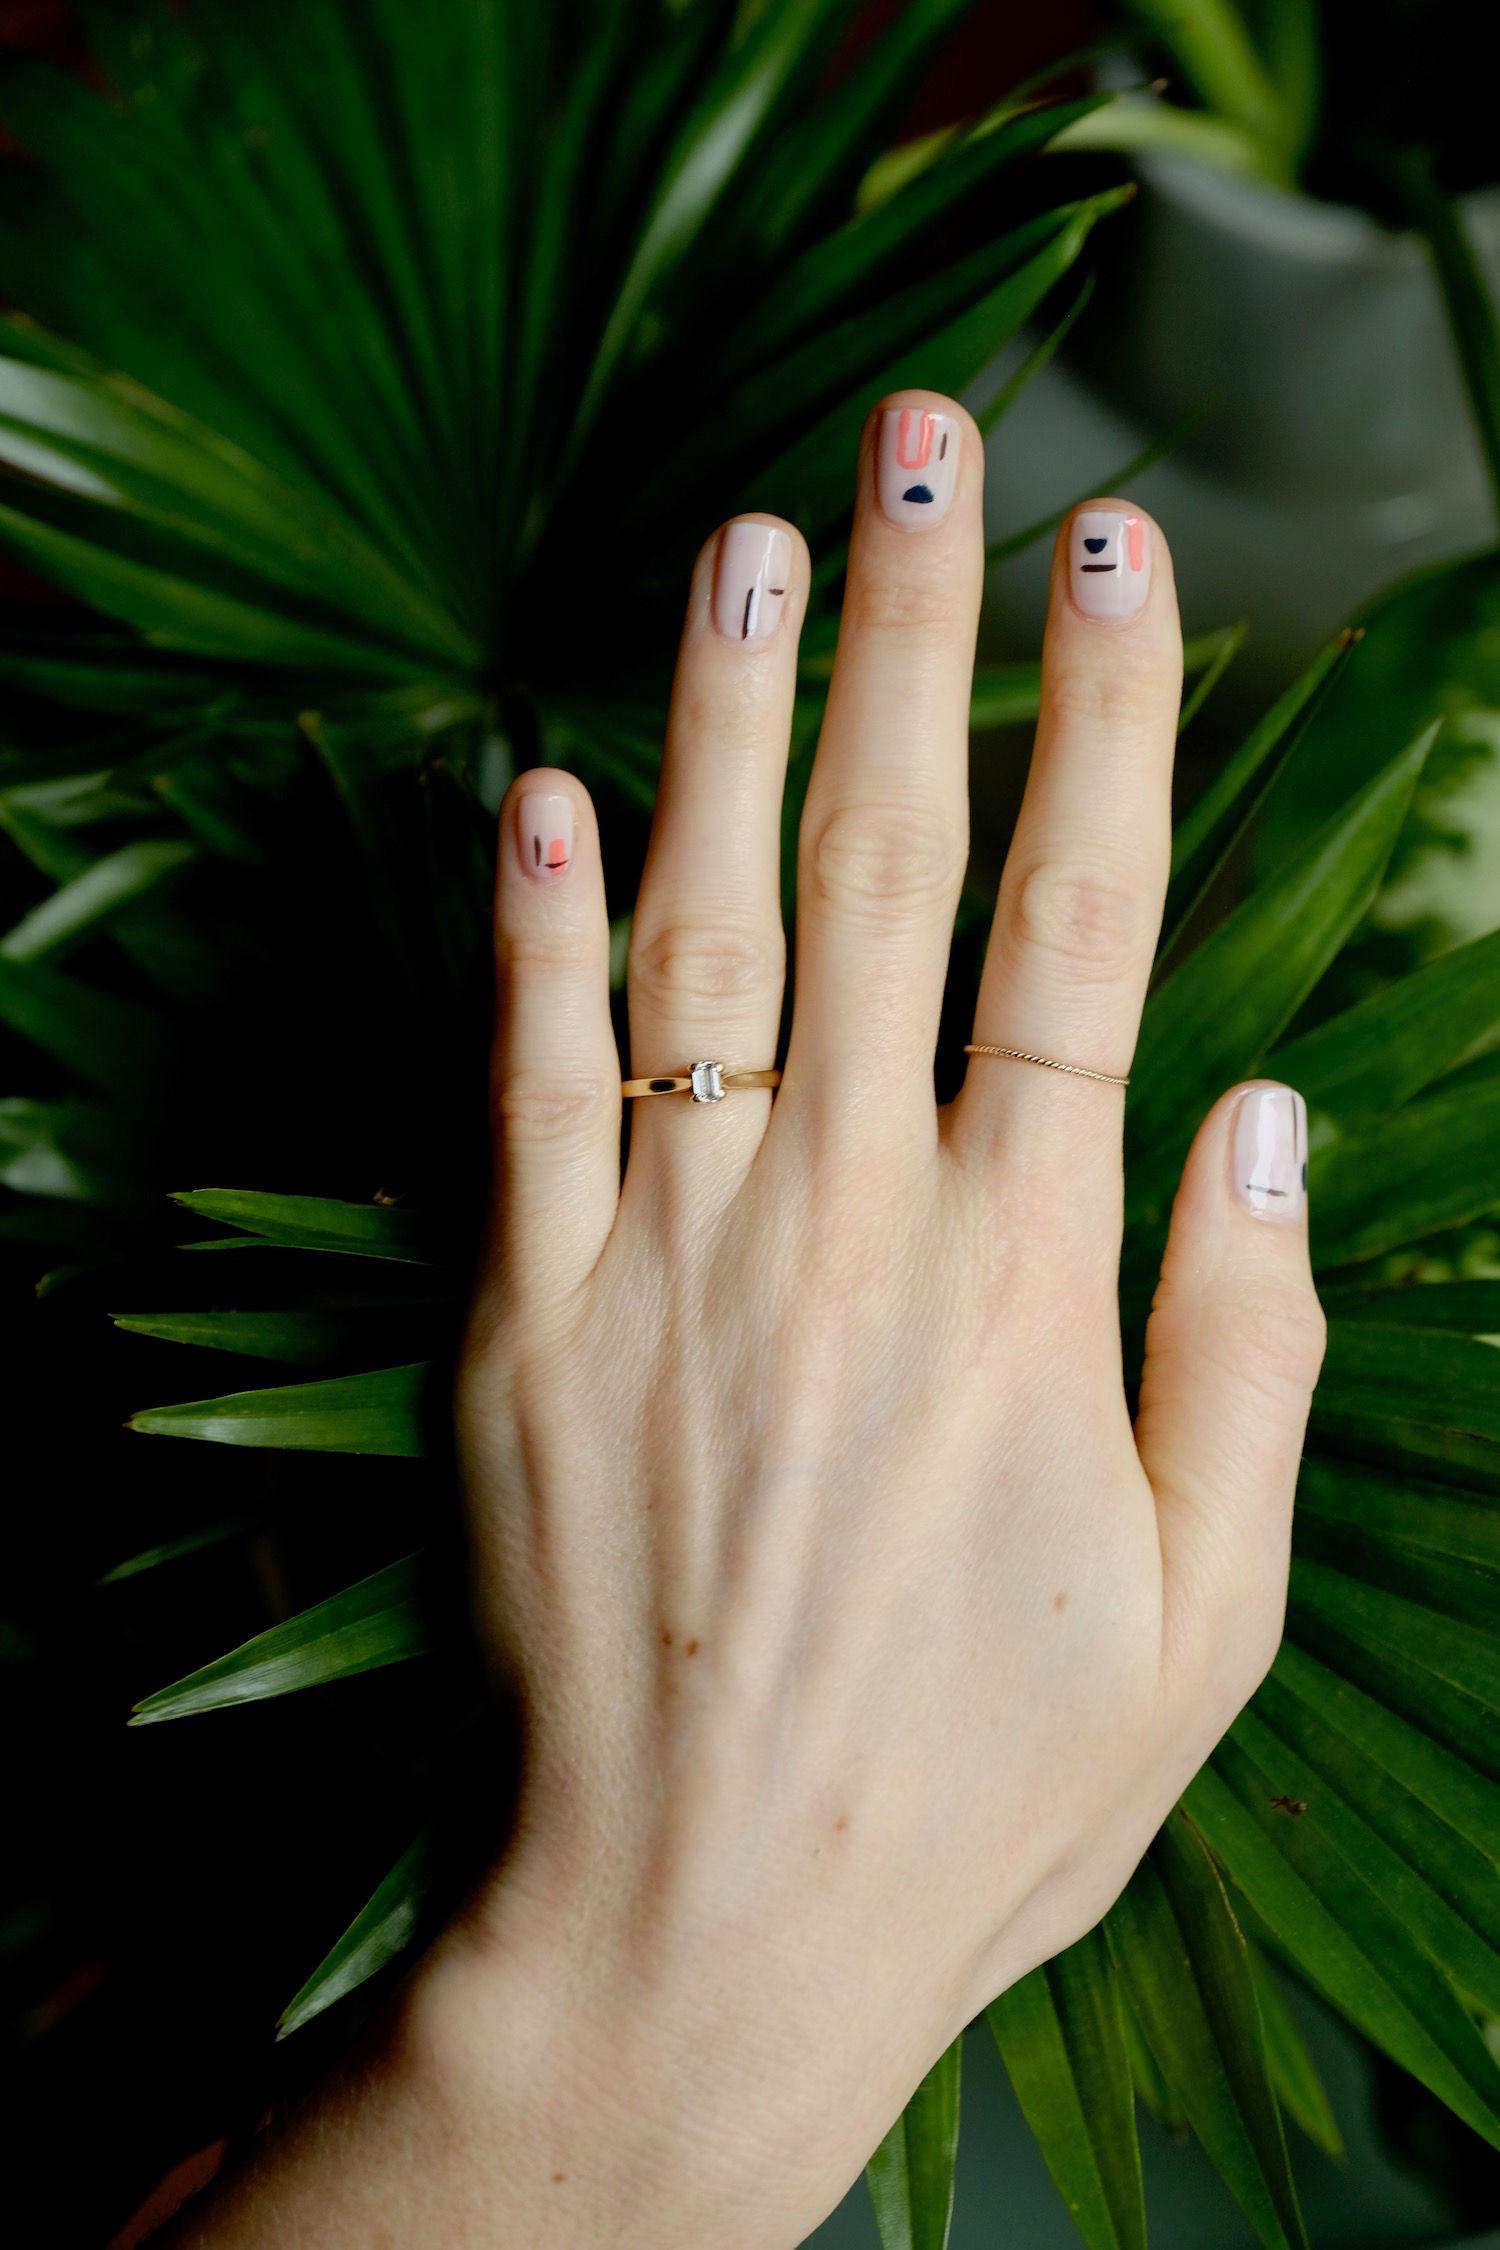 Beautyblog Beautyblogger BARE MINDS Elina Neumann arty Nailart Miro 1